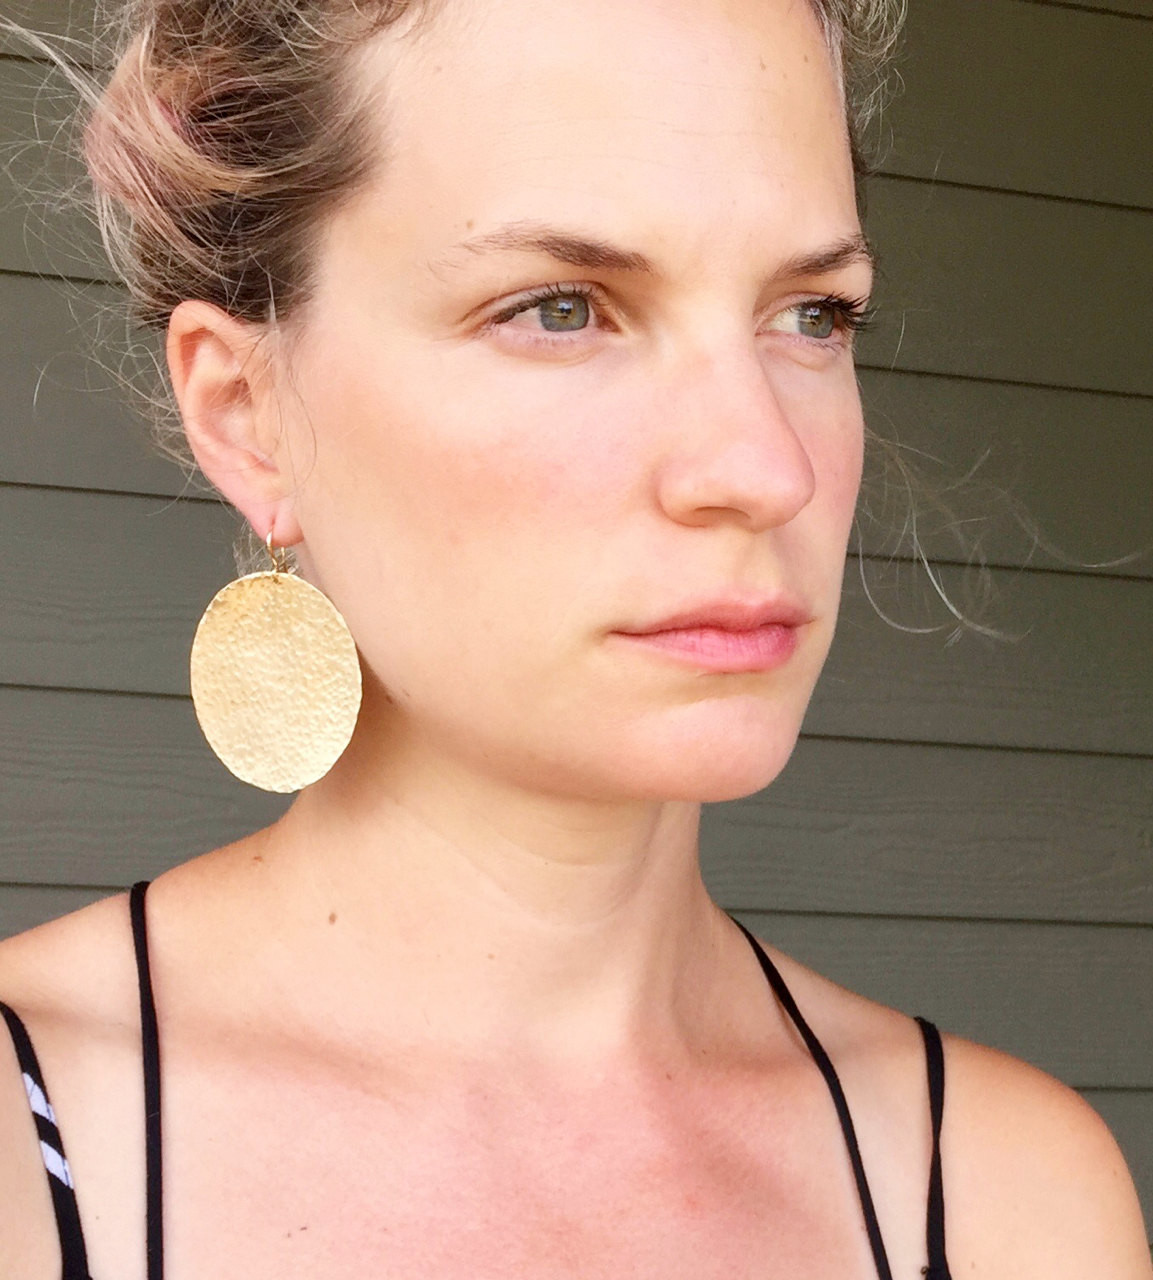 stone effect dangle earrings for women Natural boho style summer earrings Geometric mint granite and brass hoop earrings